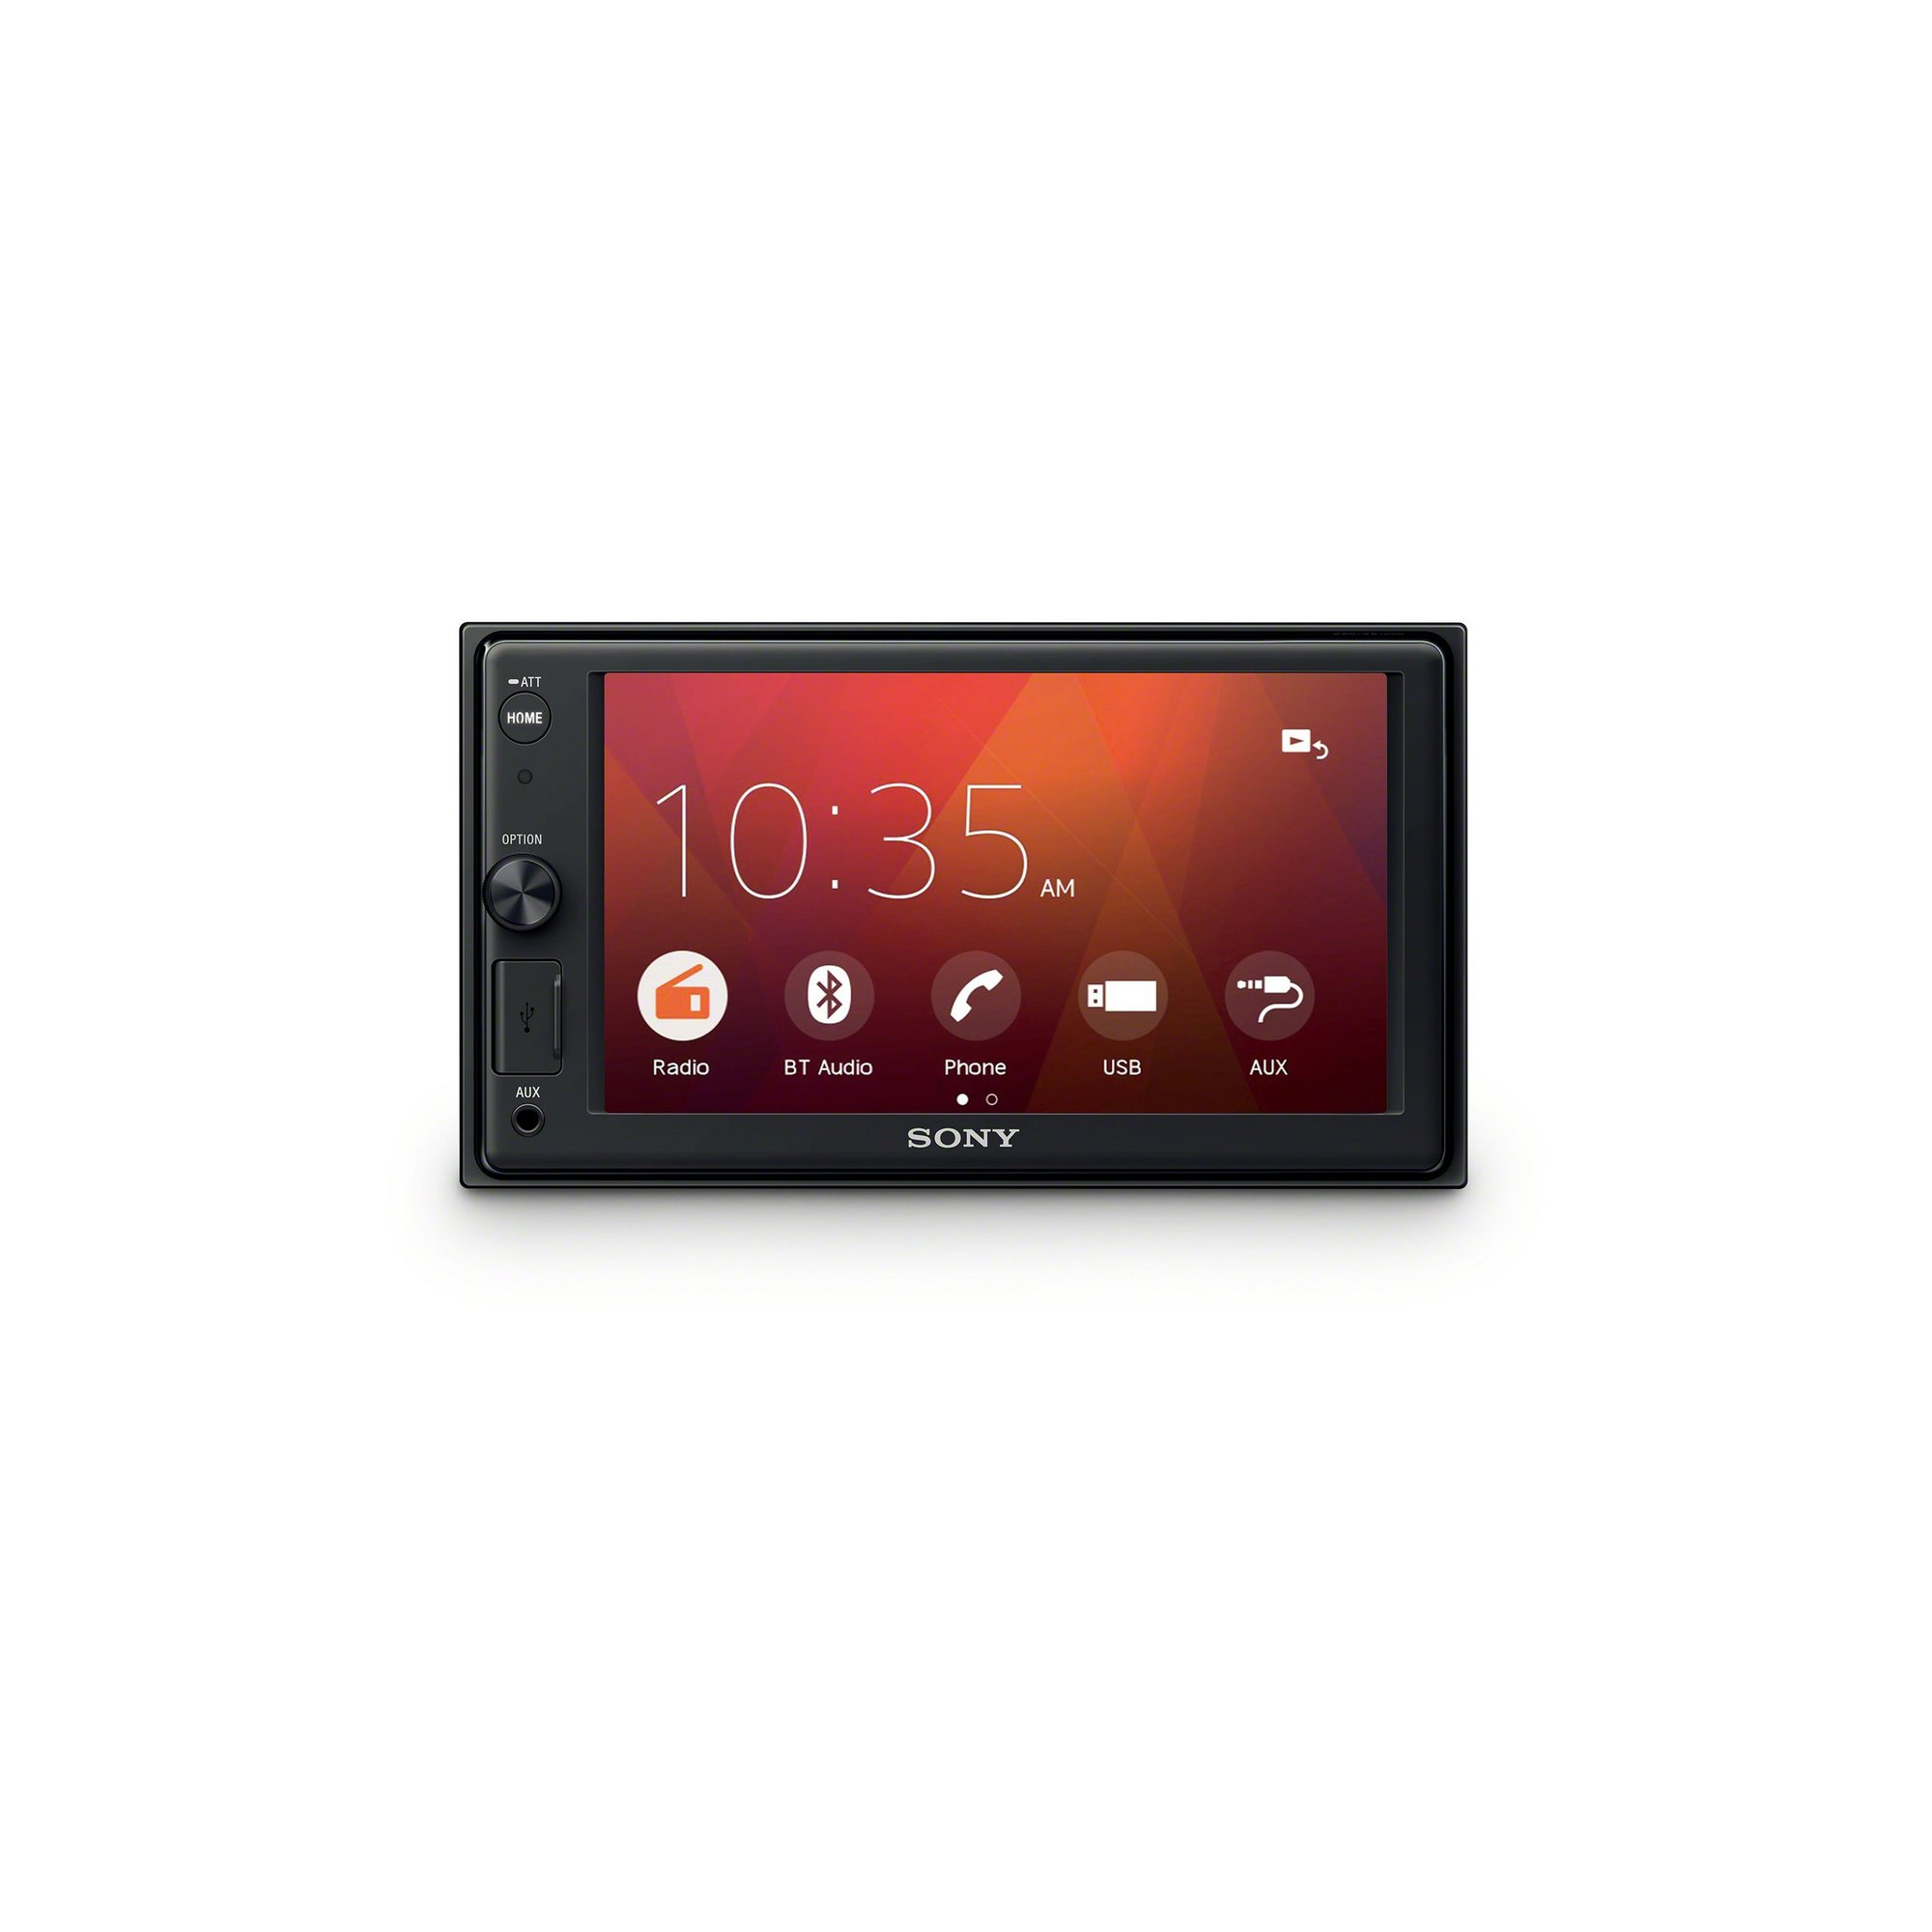 Image of Sony XAV-1500 Bluetooth Car Stereo with WebLink Cast